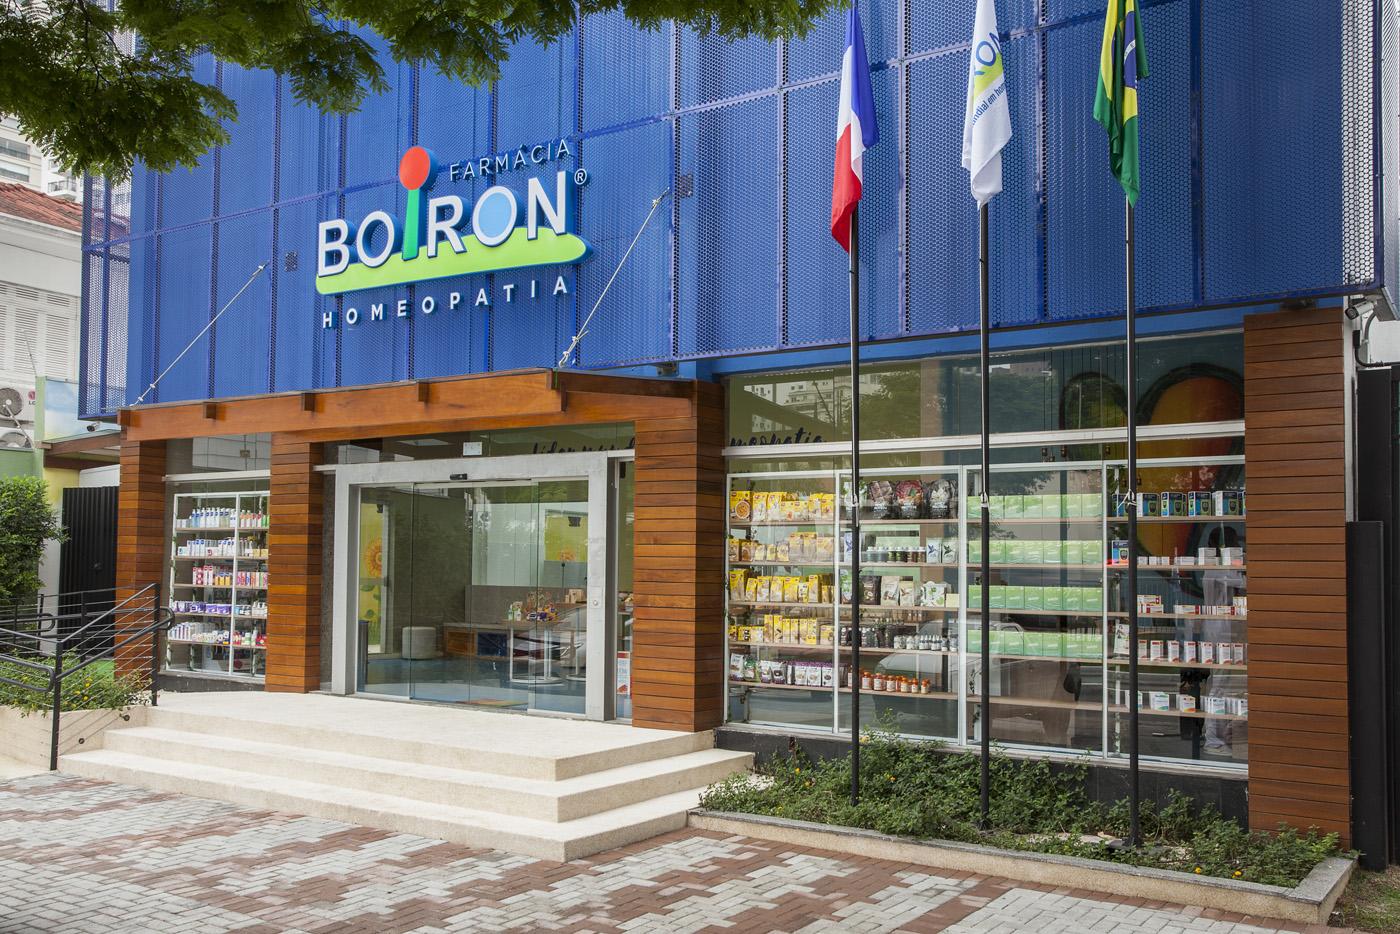 Imagem Farmácia Boiron